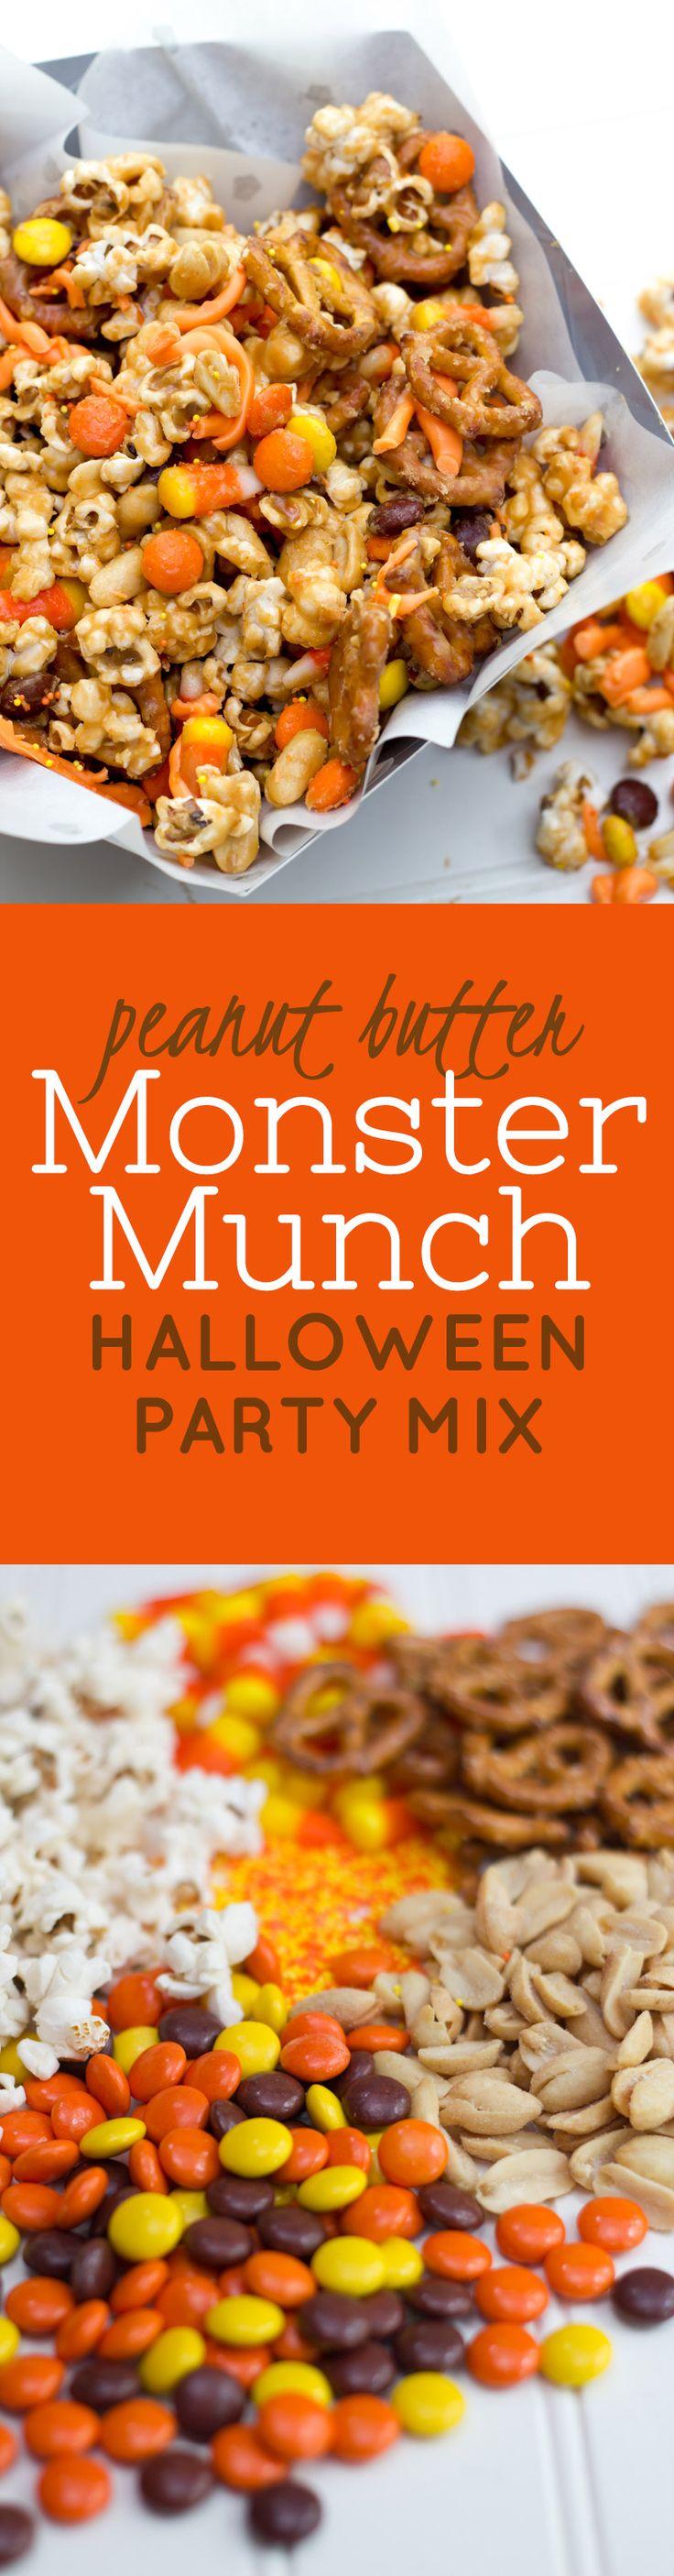 86 best Halloween images on Pinterest